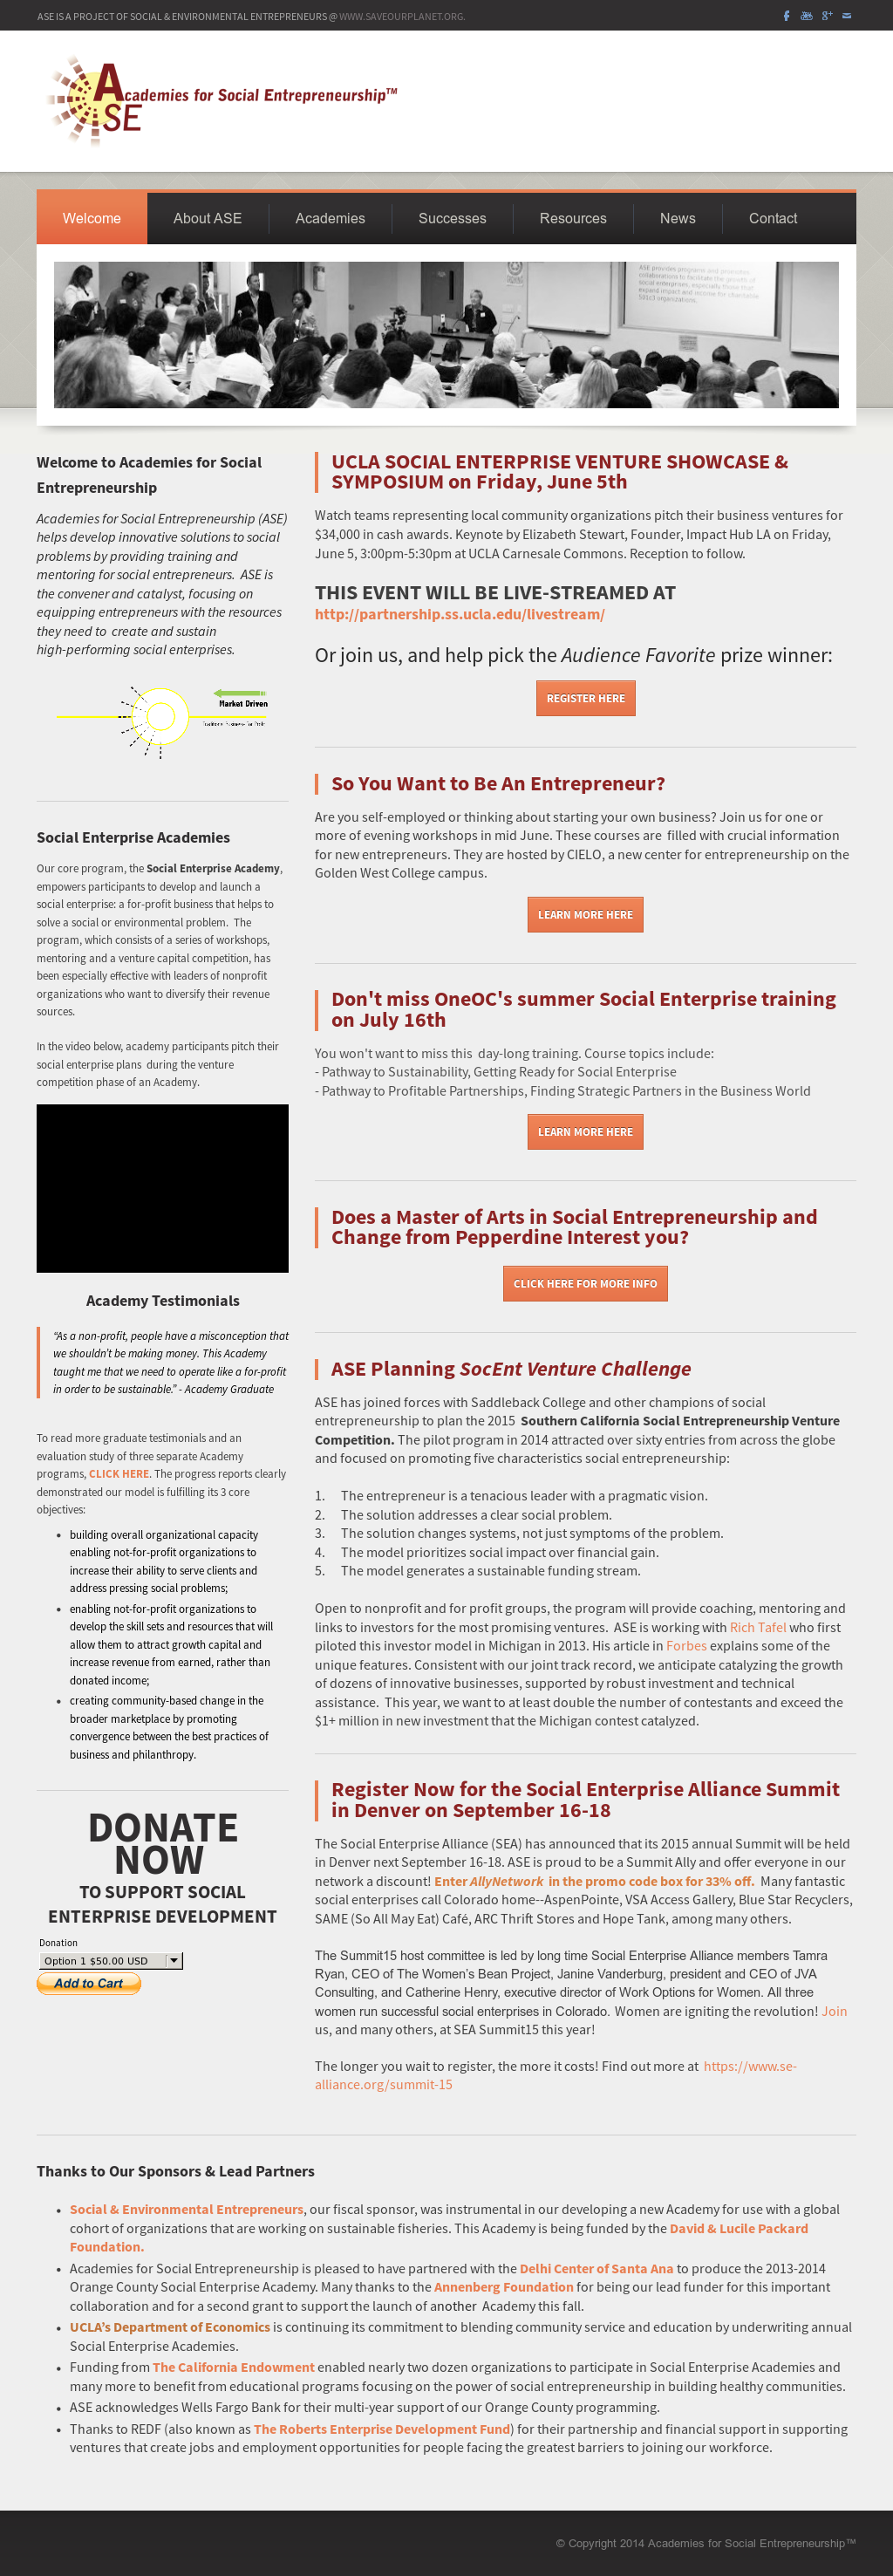 Academies For Social Entrepreneurship Competitors, Revenue